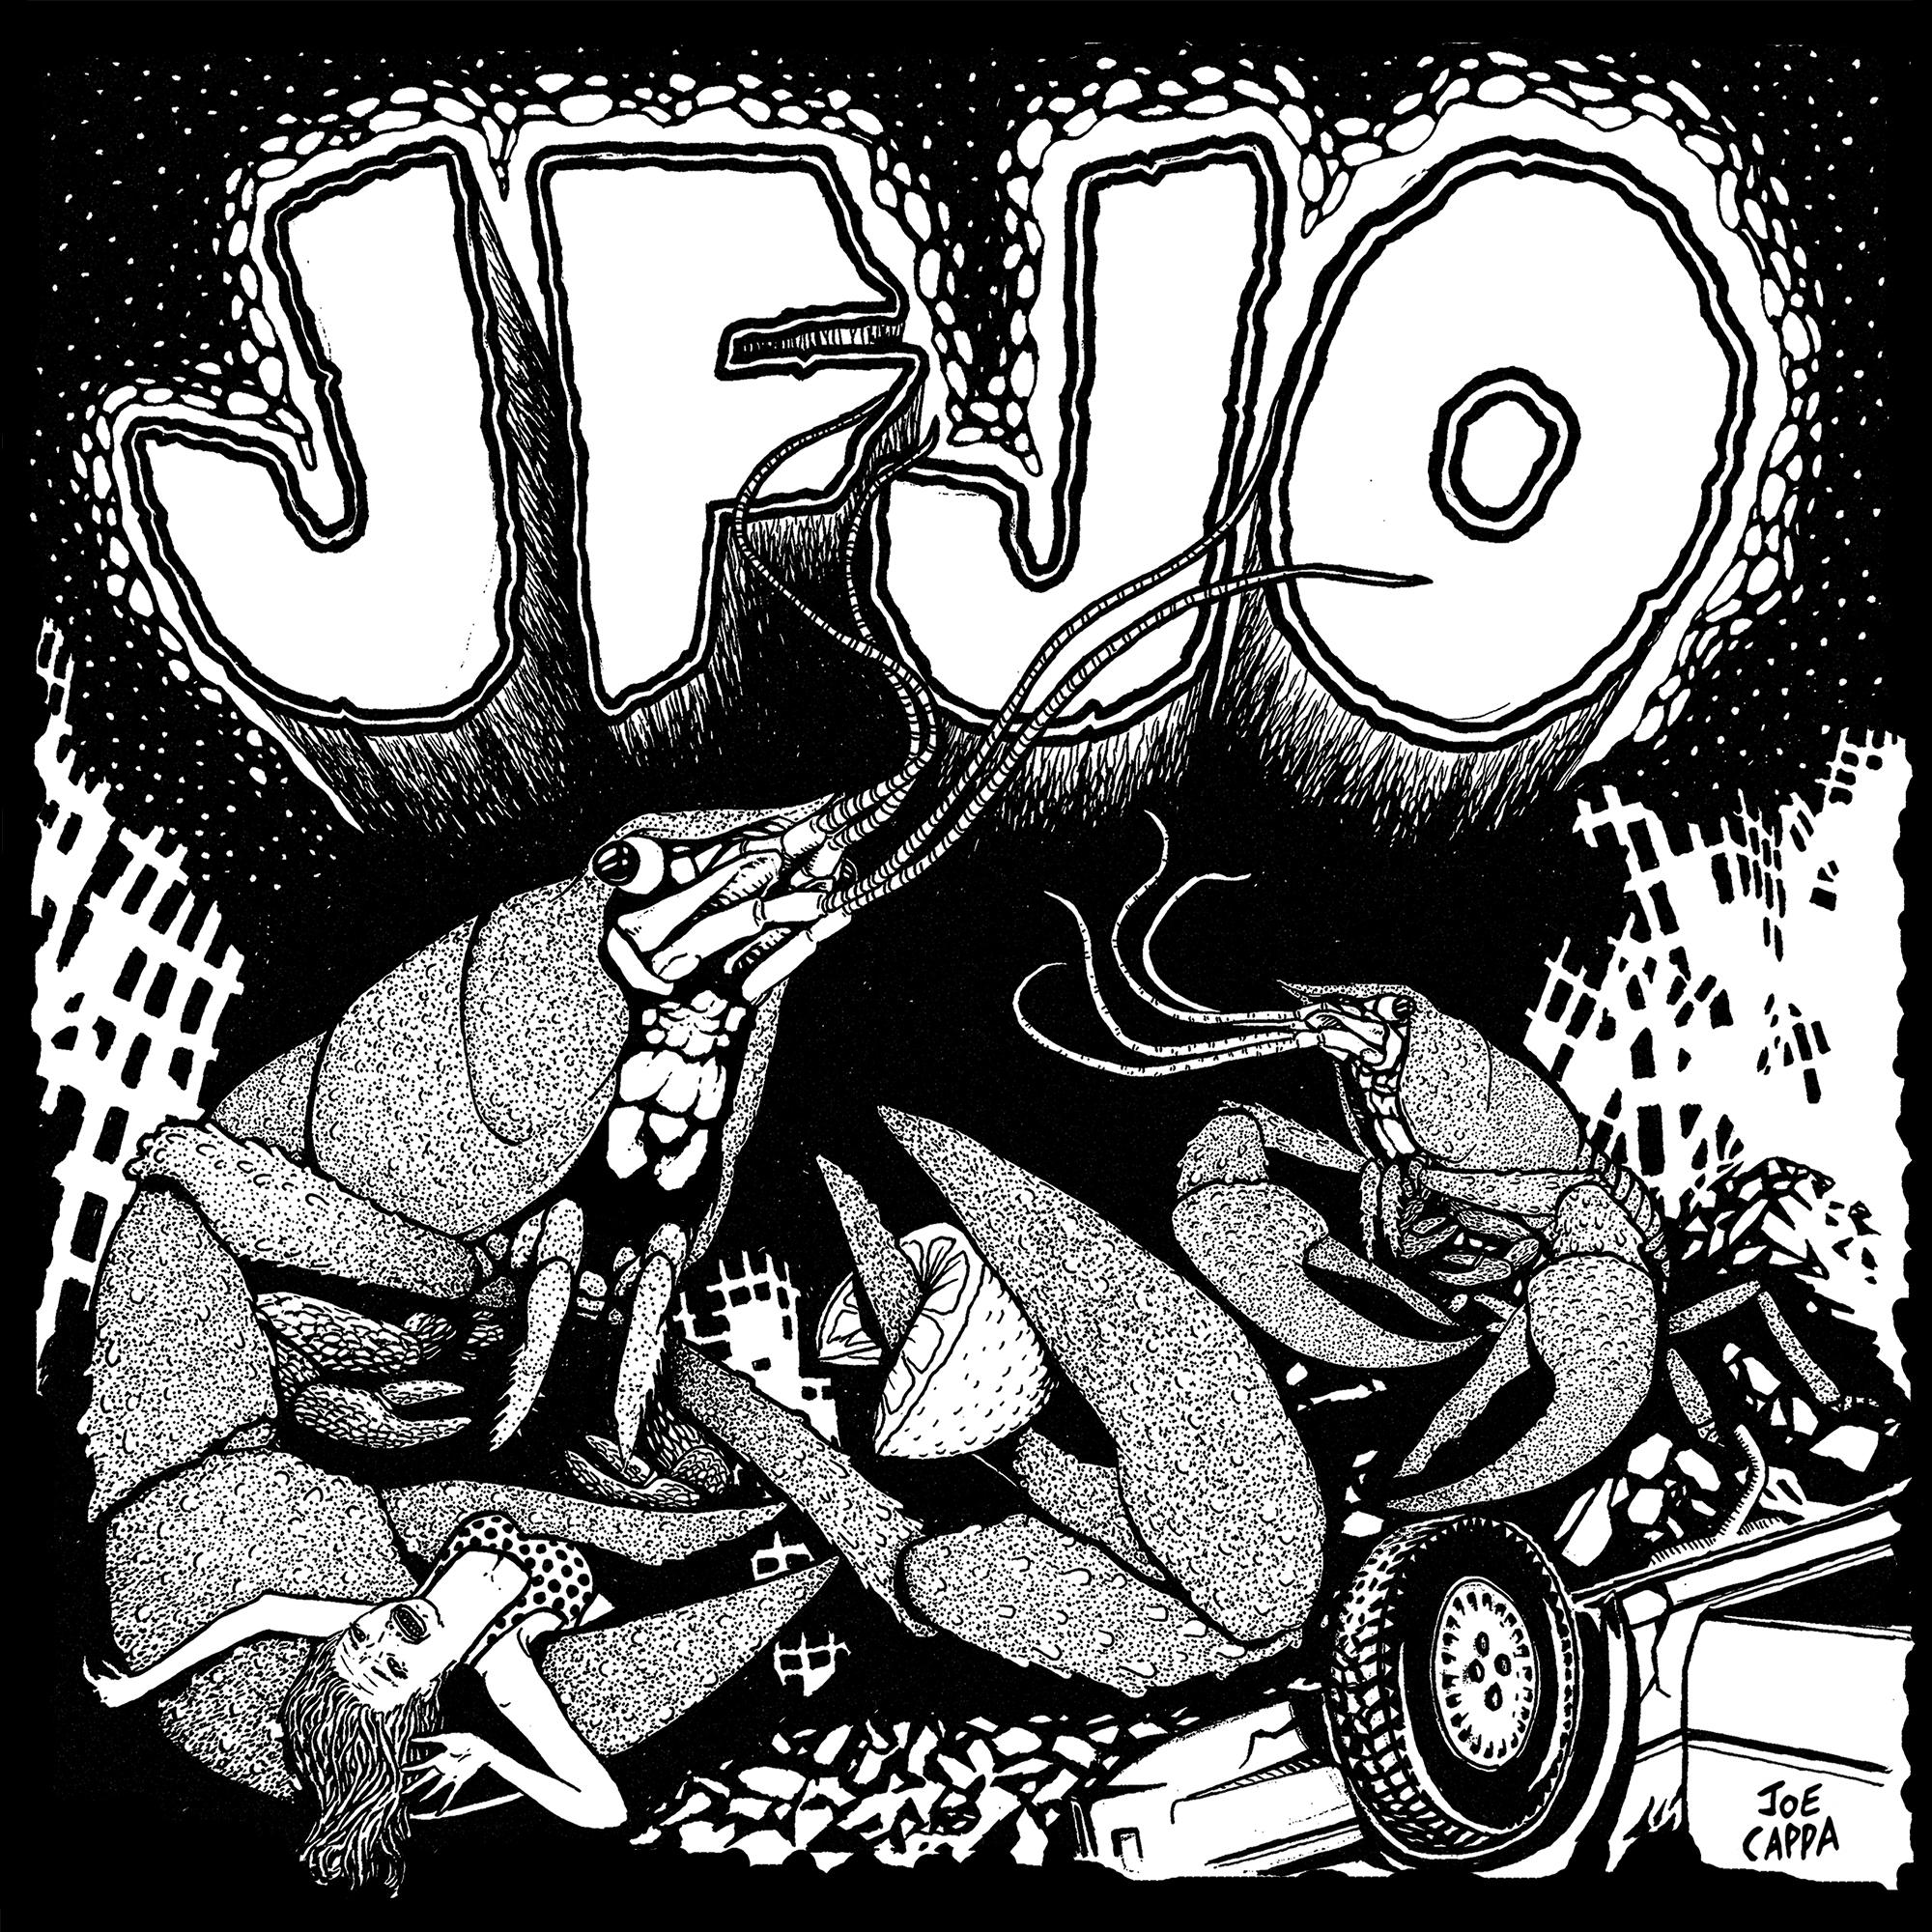 JFJO JAZZFEST CRAWFISH.jpg